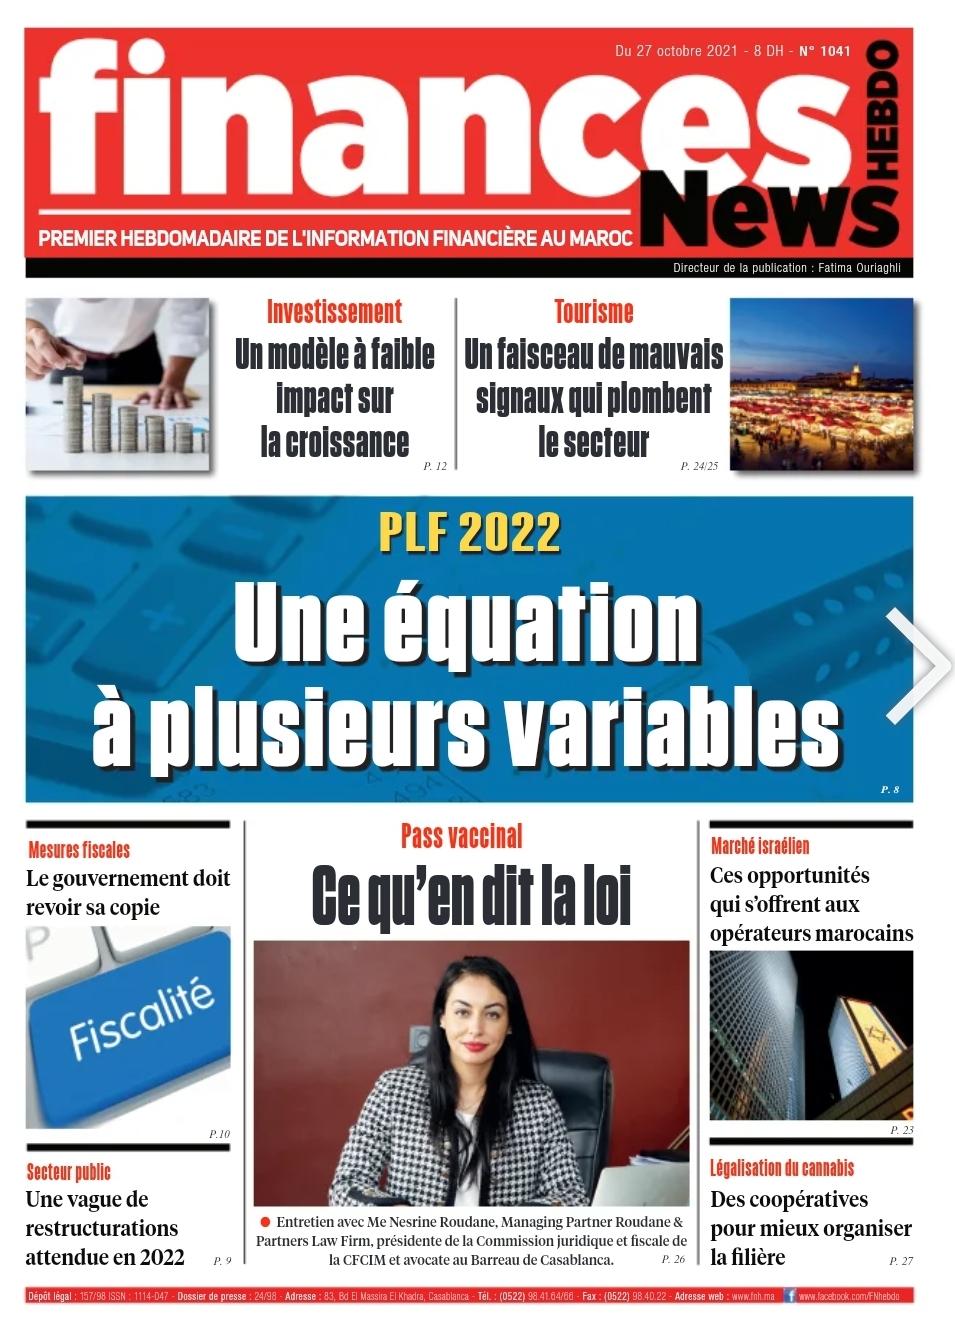 Finances News Hebdo numéro 1041